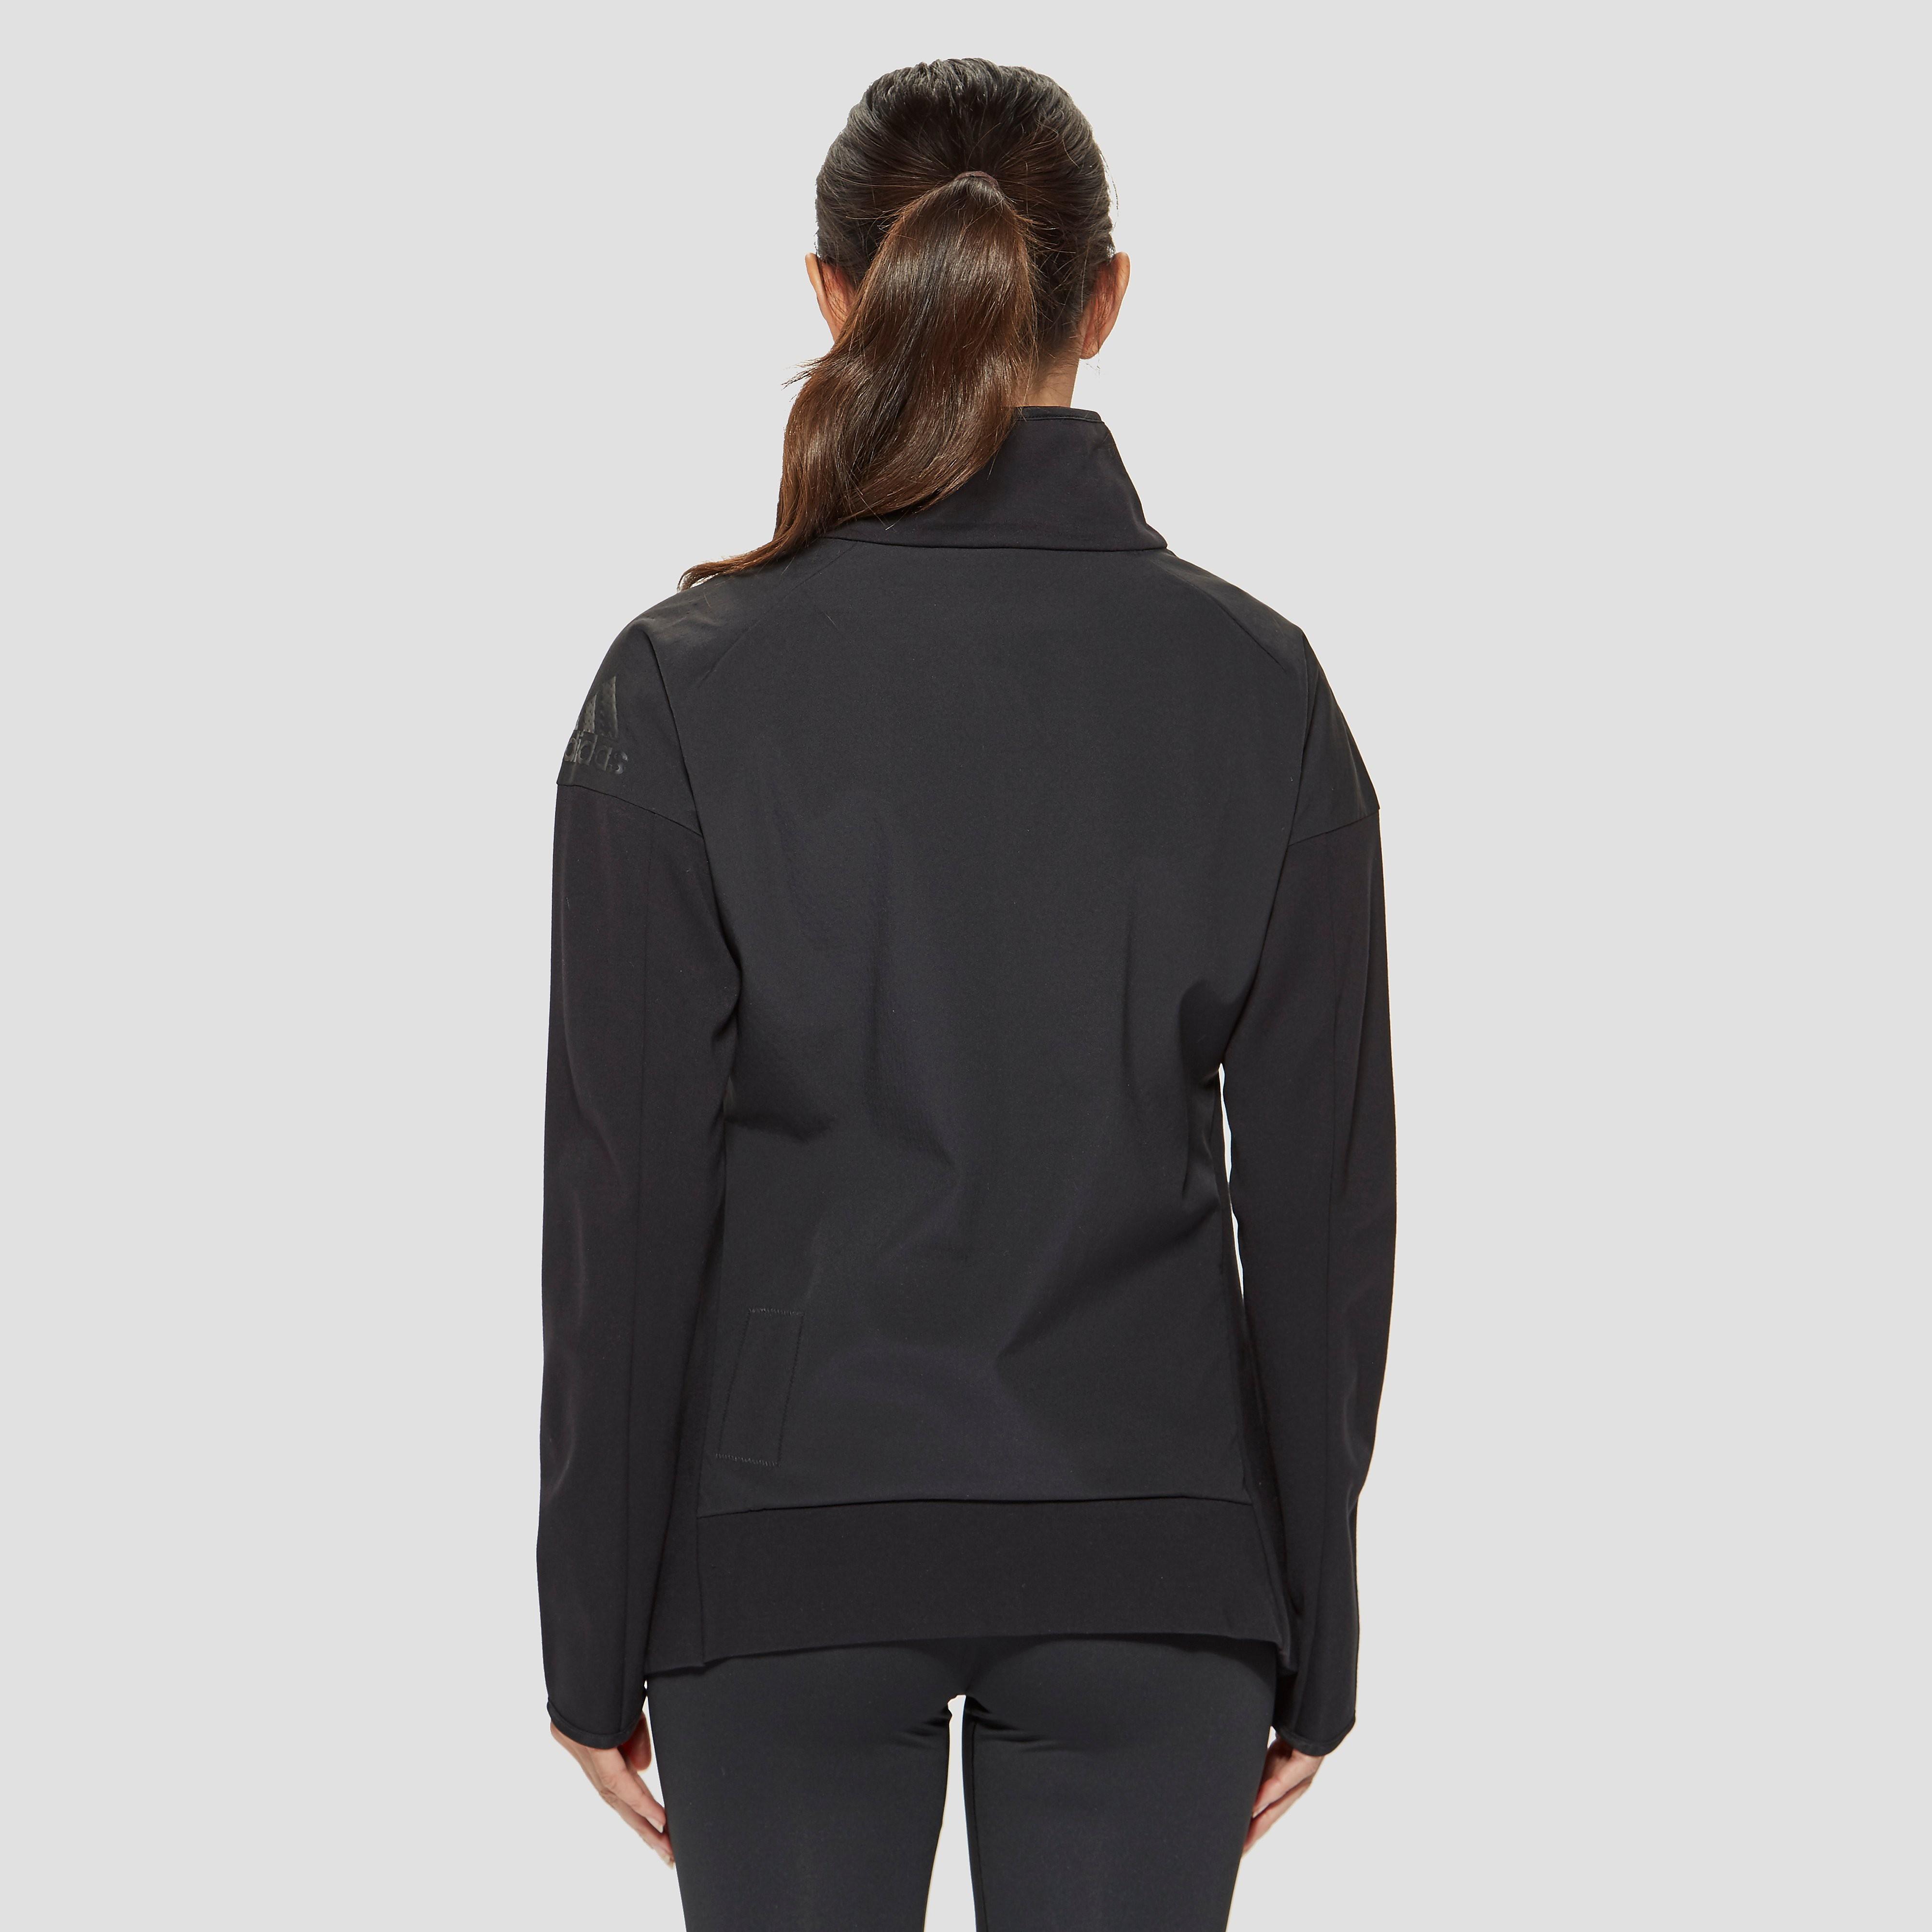 adidas Z.N.E Light Cover-Up Women's Training Jacket